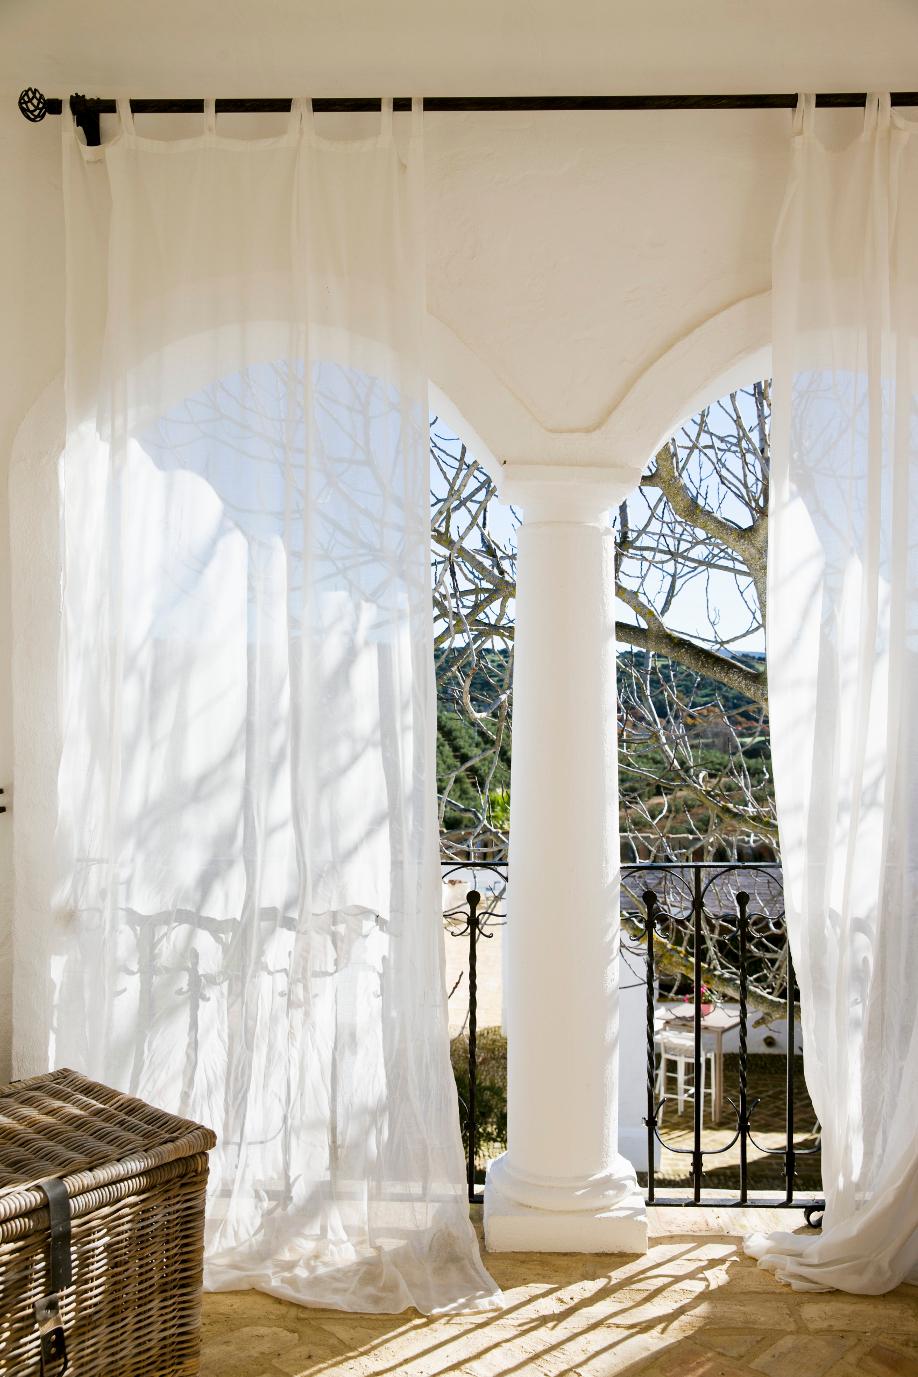 westwing-weiß-vorhang